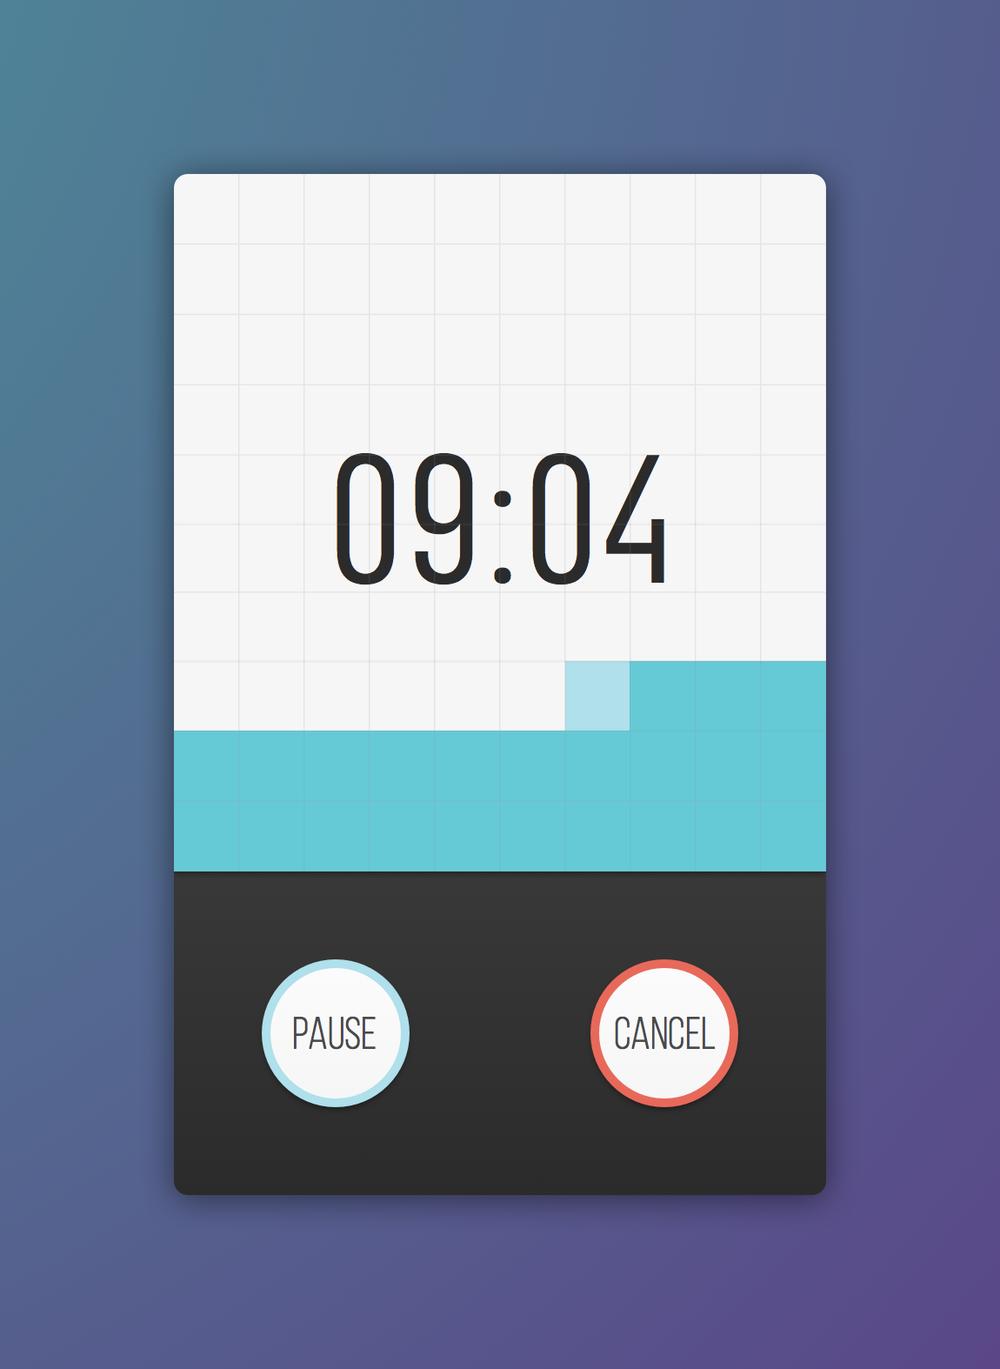 dailu-ui-14-countdown-timer.png